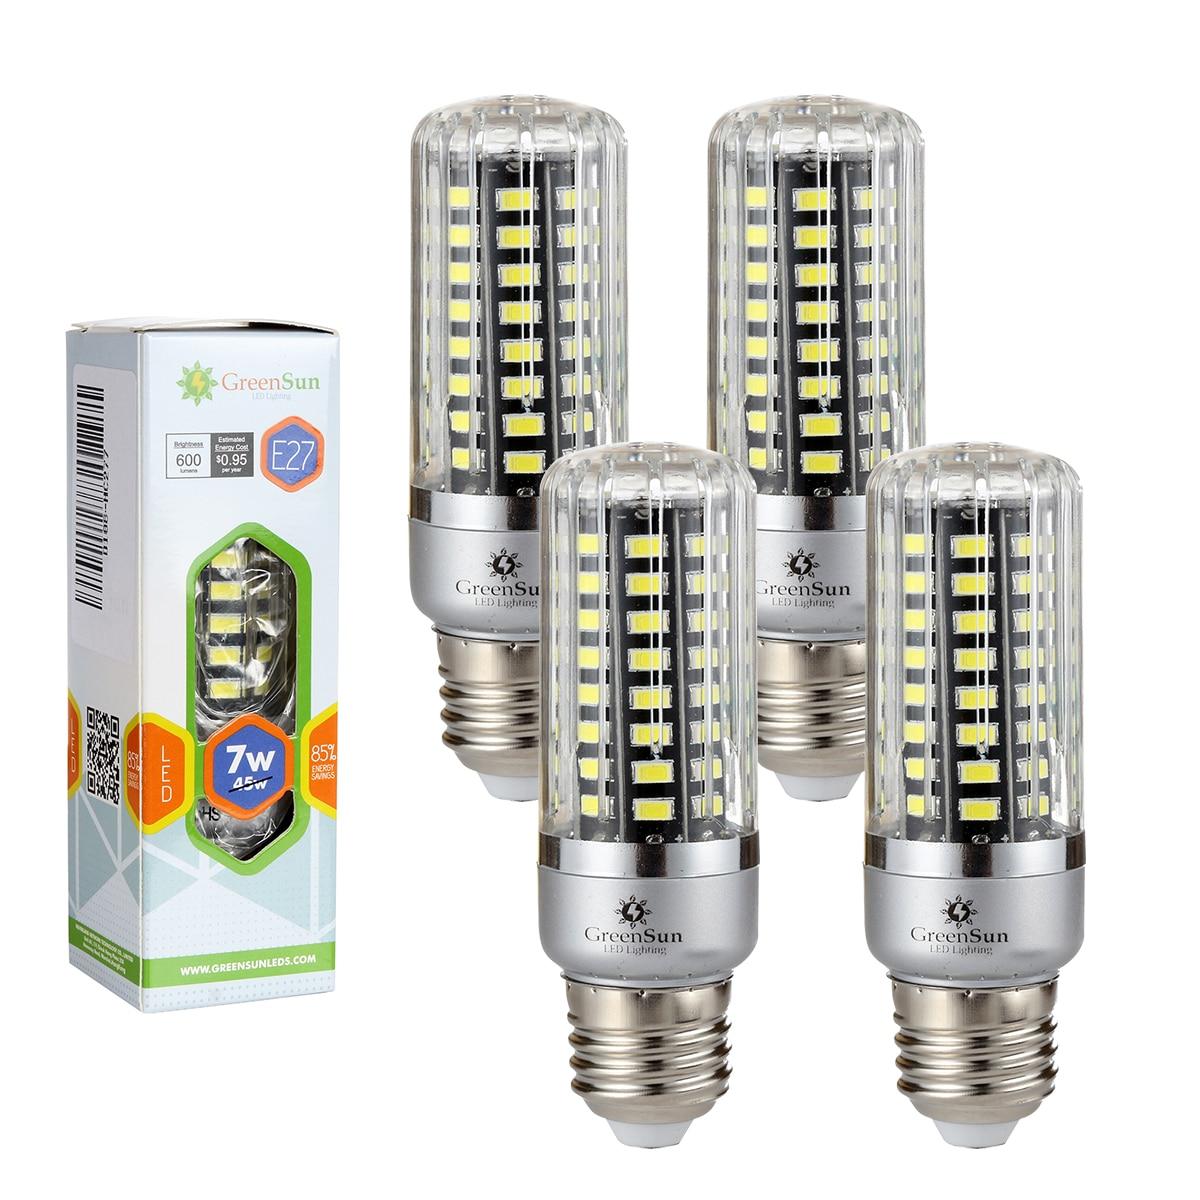 Full Watt Smart IC E27 5736 SMD LED Corn Bulb 4/10 PCS 220V 3W/5W/7W/9W/12W/15W Lamp LED No Flicker Light Bulbs led bulb e27 3w 5w 7w 9w 12w 15w real power 220v energy saving led lamp aluminium 2835smd led spotlight bulb smart ic no flicker